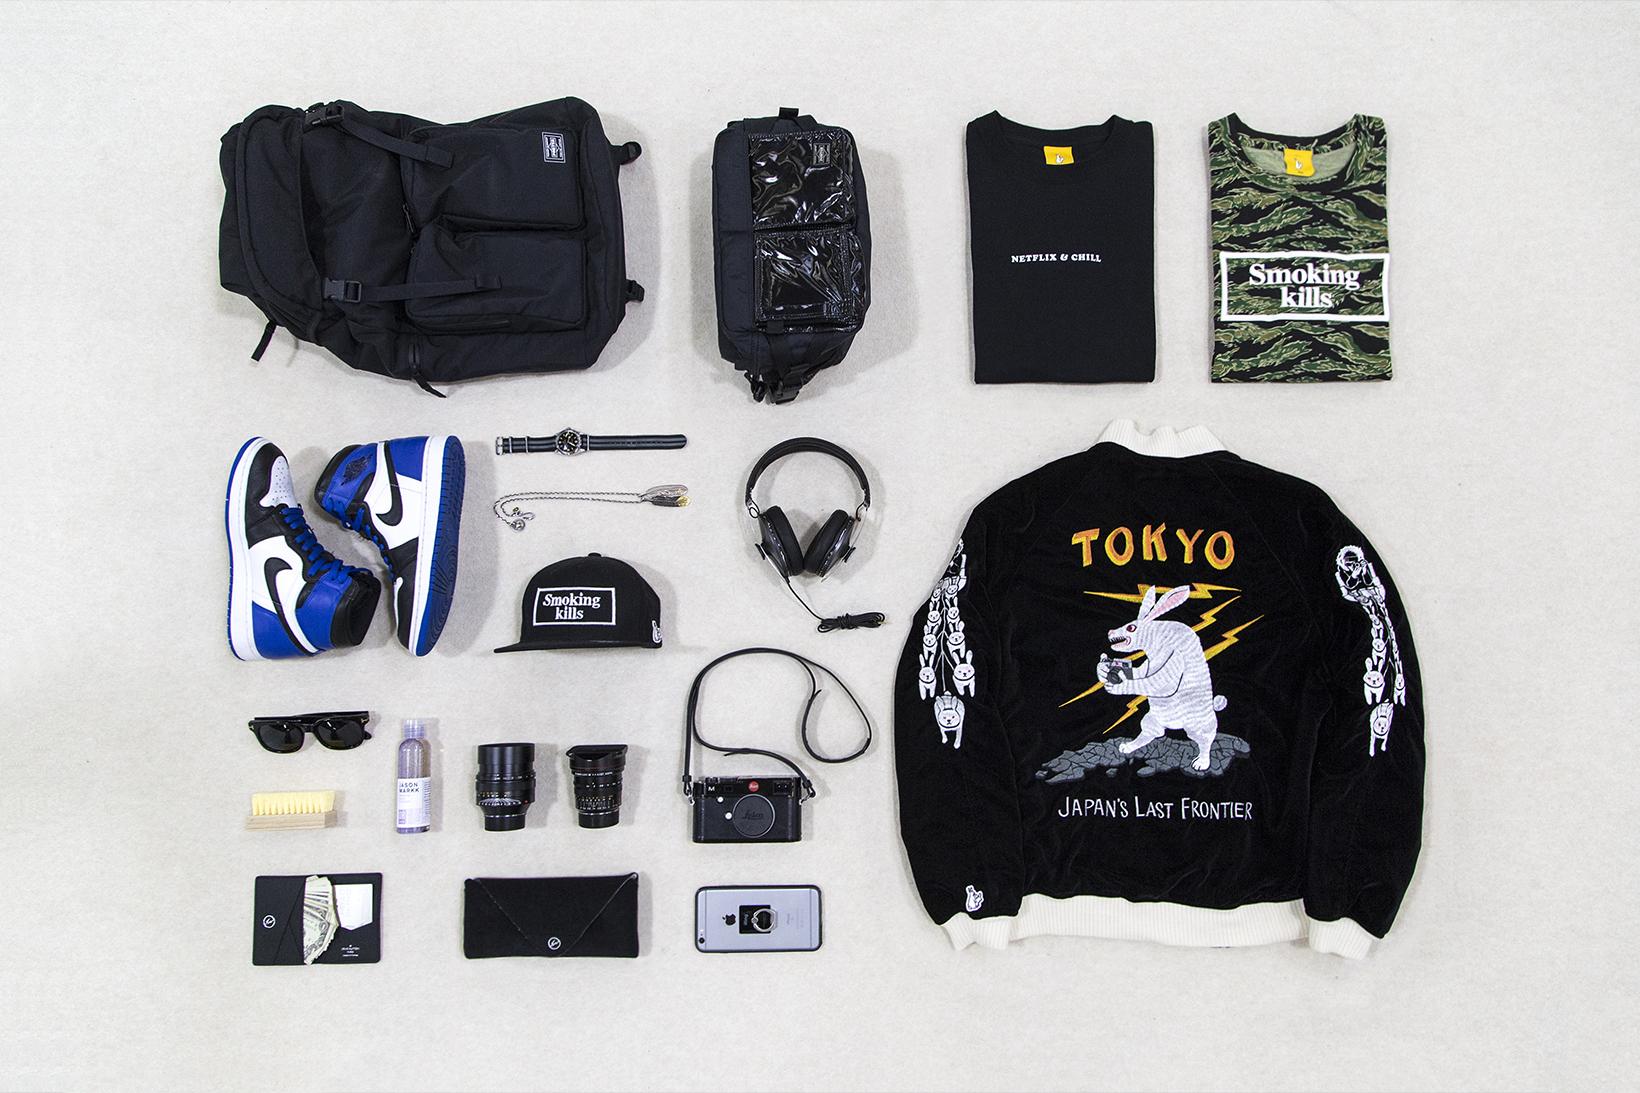 Essentials: Ryo Ishikawa of DENIM BY VANQUISH & FRAGMENT / Fxxking Rabbits